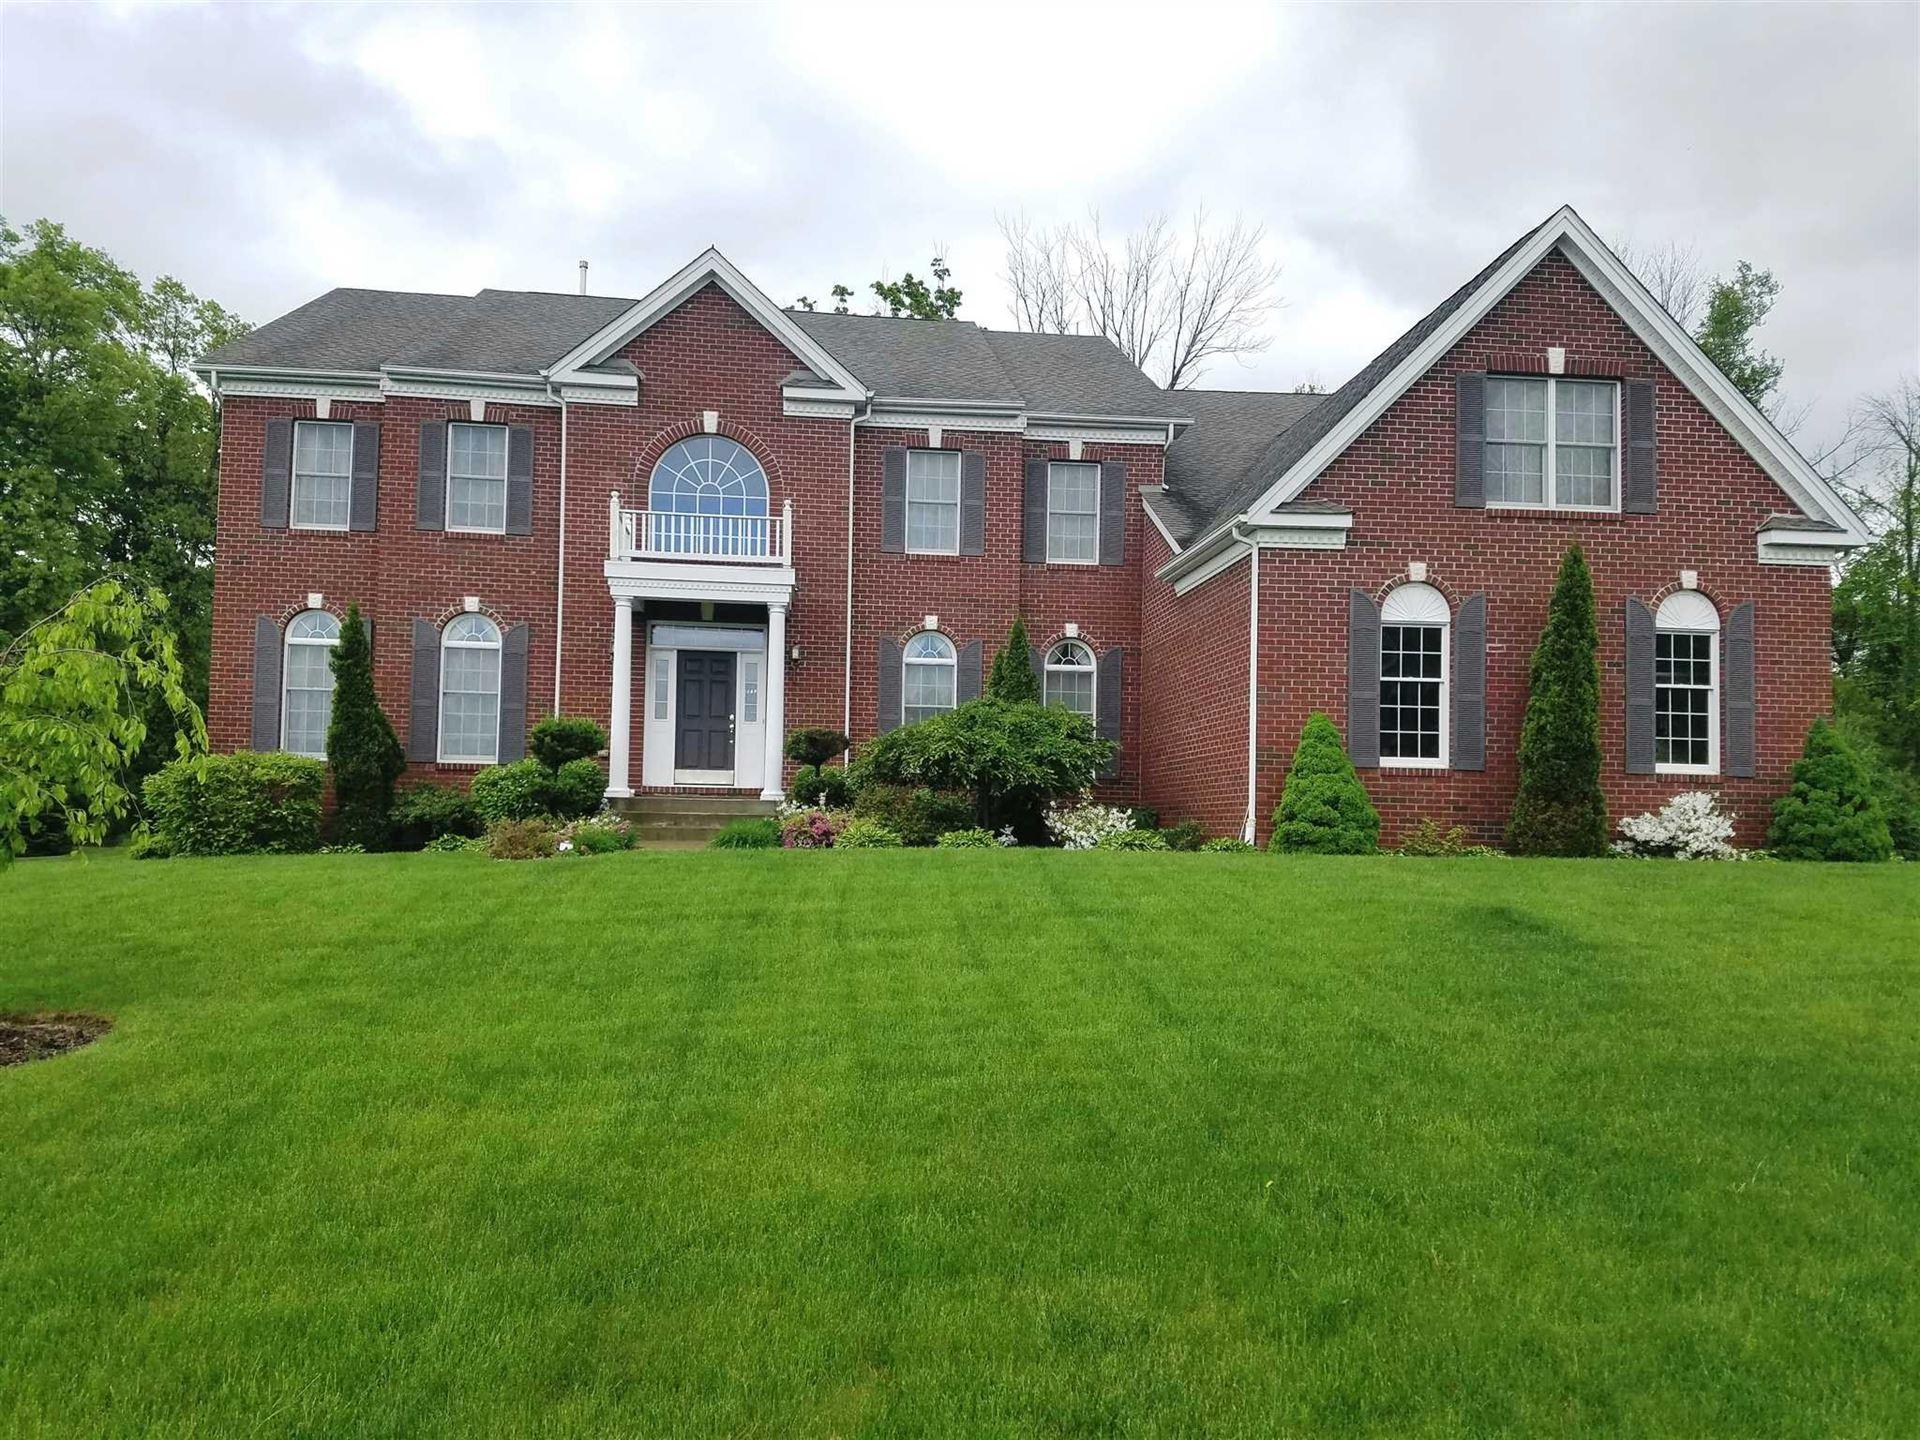 10 Shamrock Hills Dr, Wappinger, NY 12590 - #: 395516